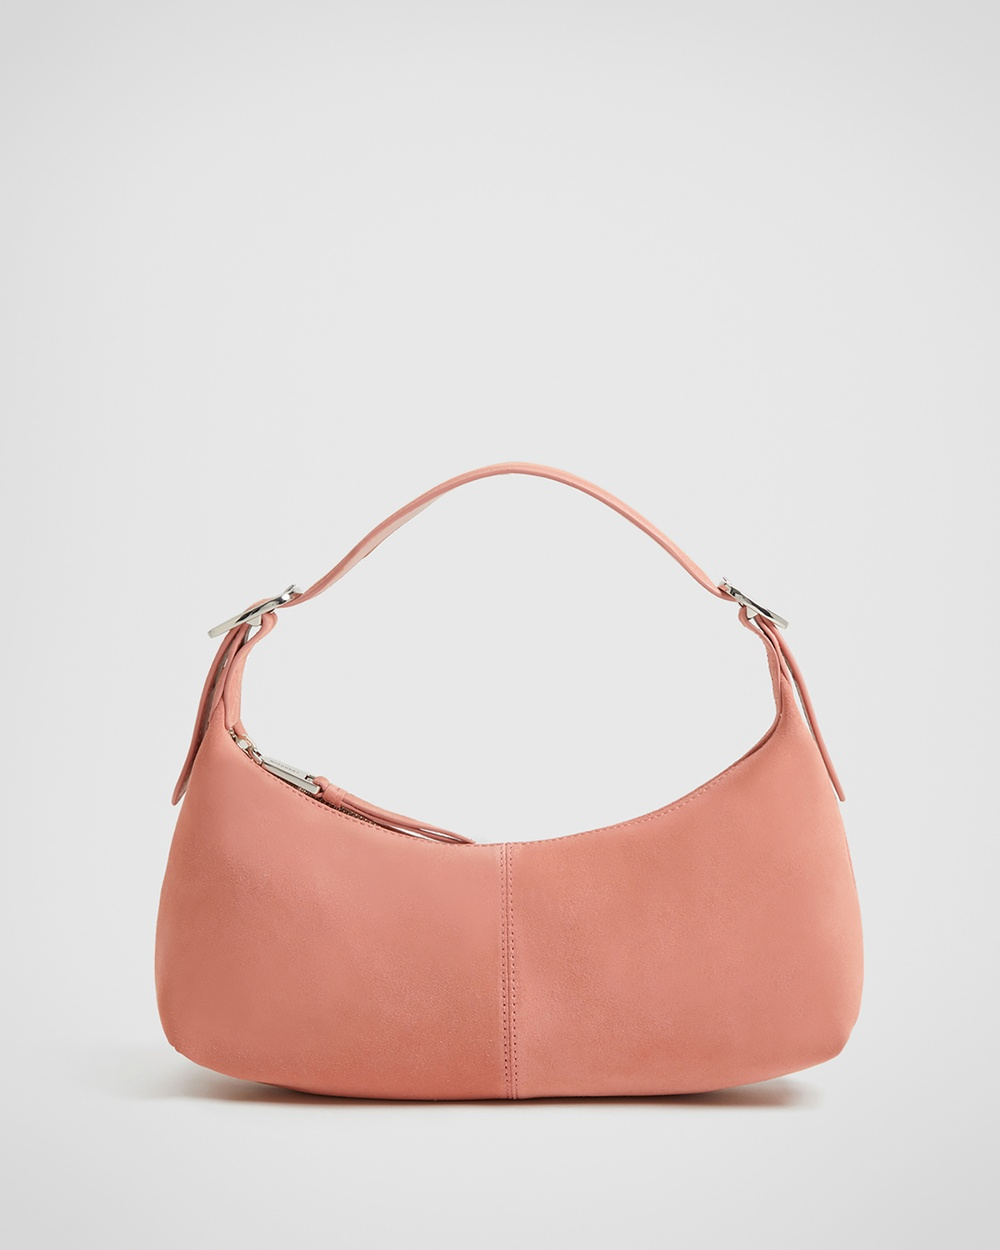 Witchery Zoe Suede Shoulder Bag Bags orange